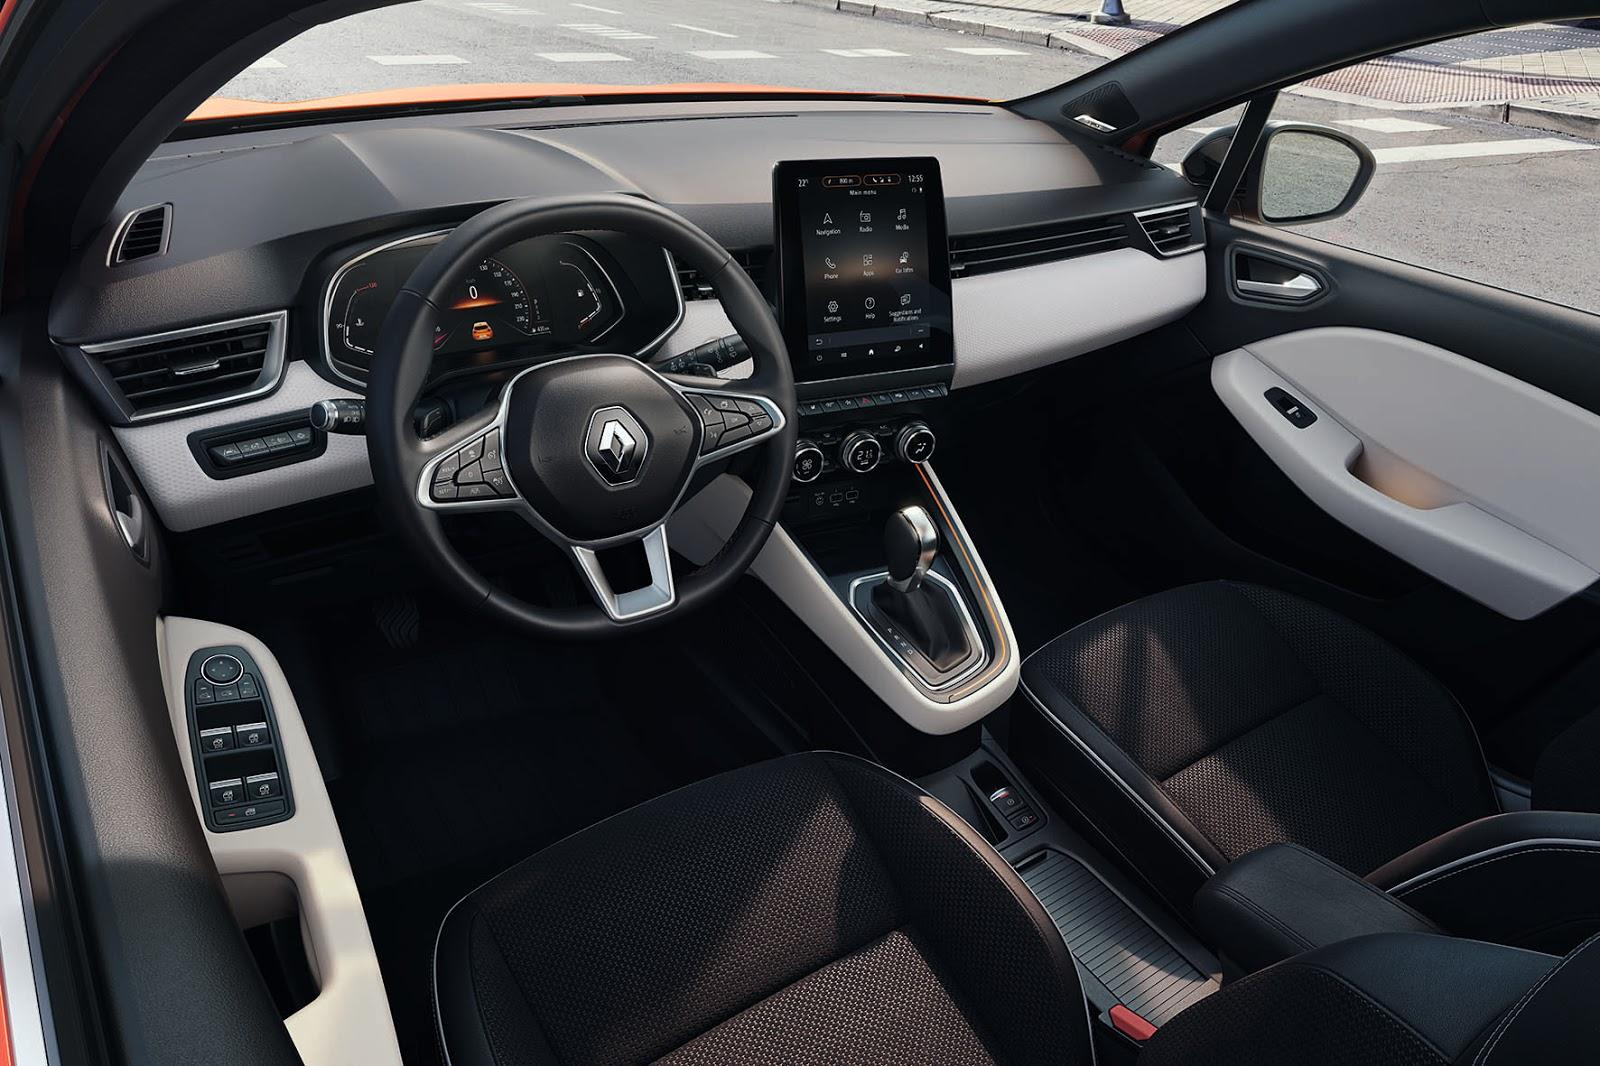 22B 2BAll2BNew2BRenault2BClio Intens2B252822529 1 Το φθινόπωρο έρχεται στην Ελλάδα το νέο Clio Renault, Renault Clio, zblog, καινούργιο, καινούρια